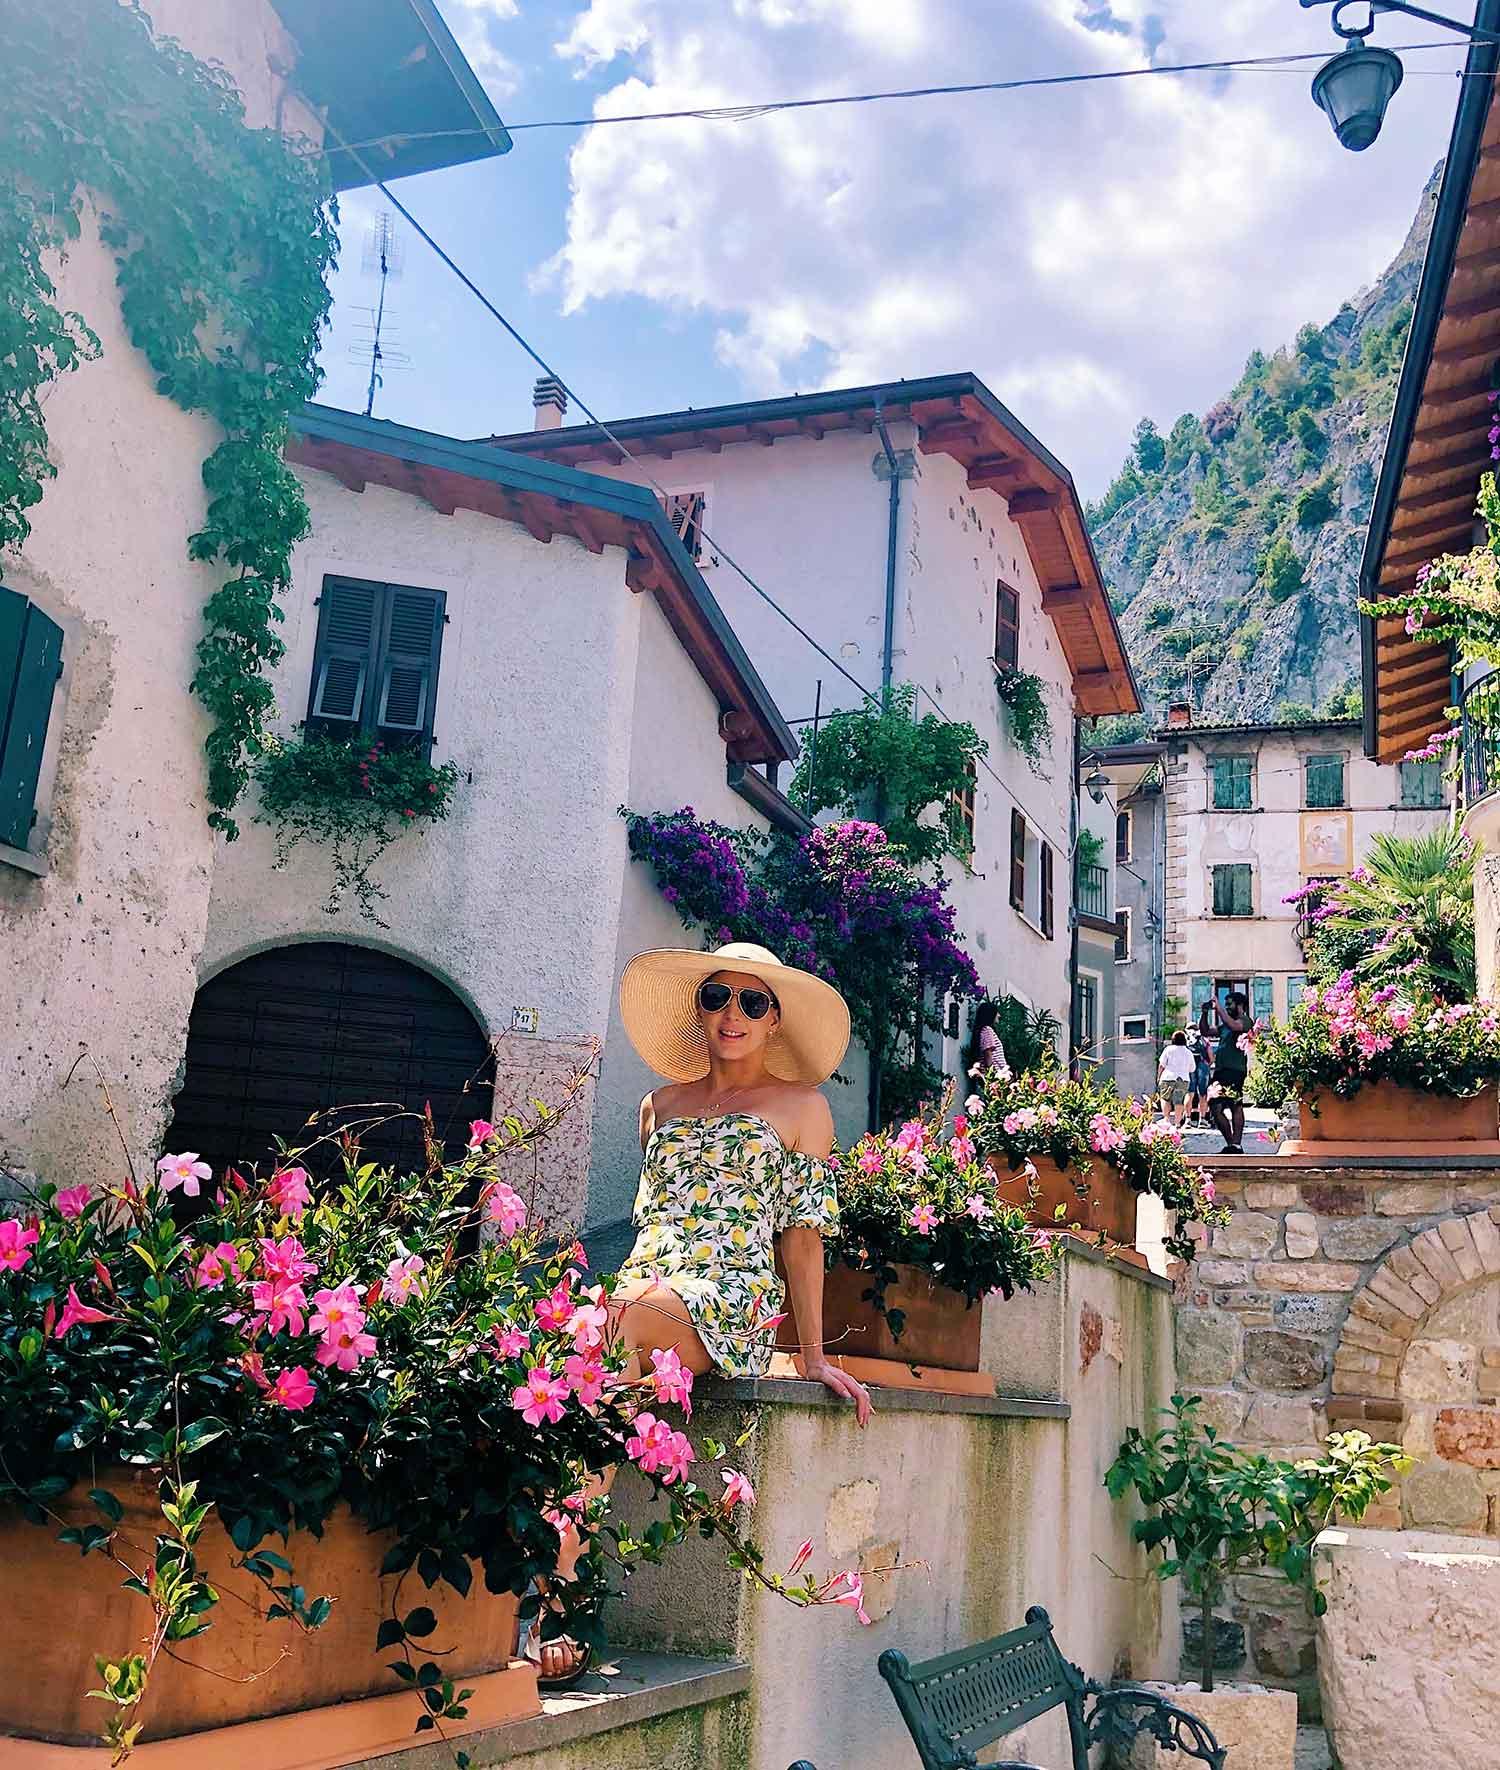 pink flowers old street Limone Sul Garda Italy Eve Dawes travel blogger